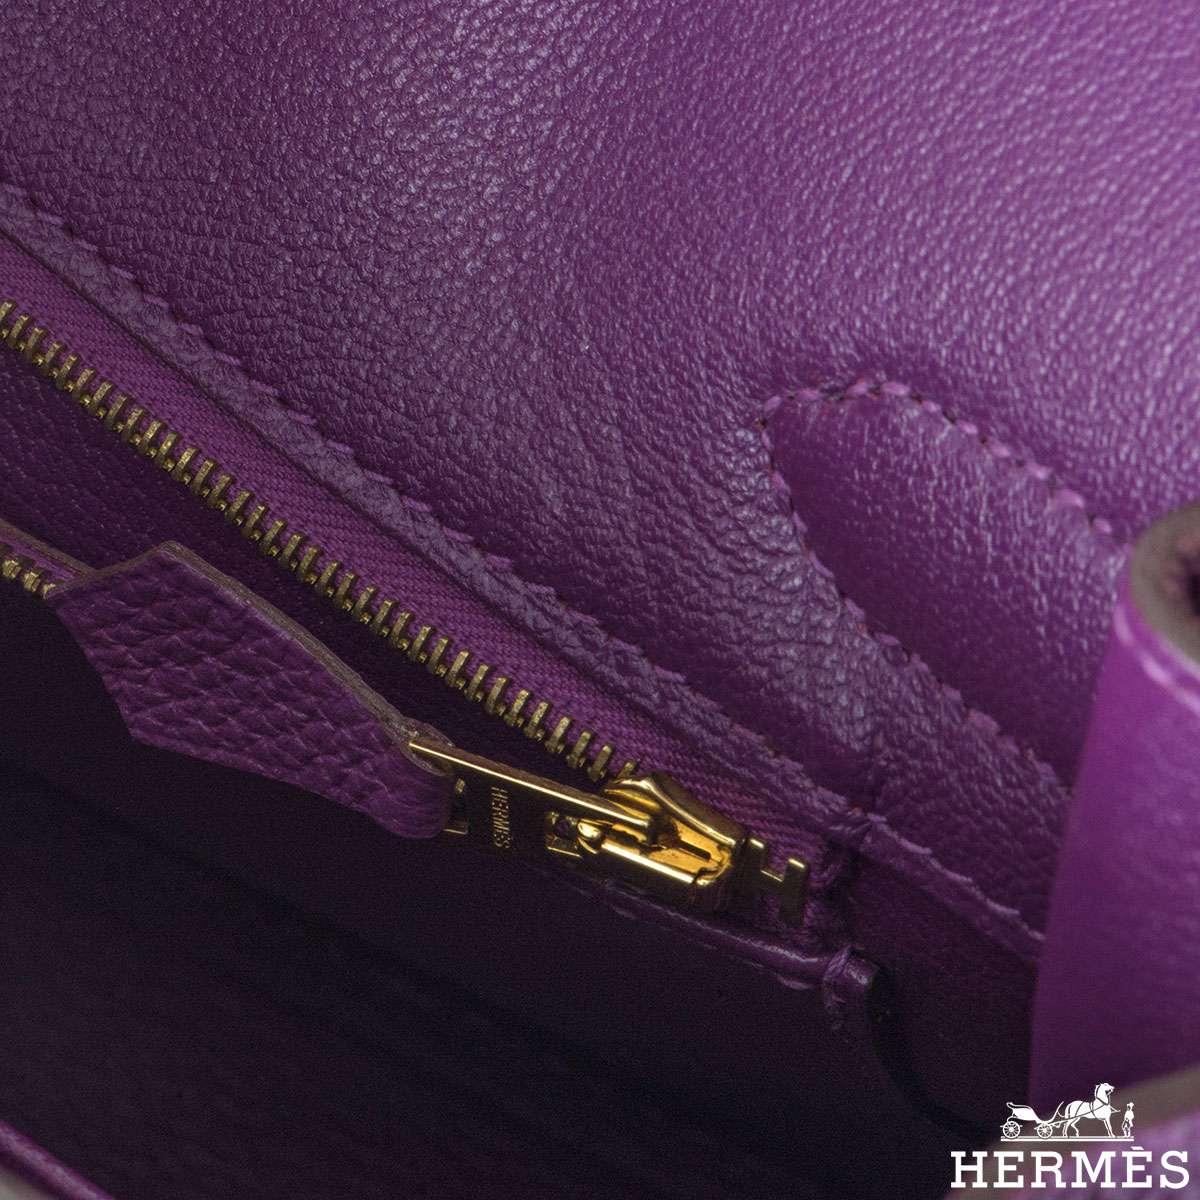 Hermes Birkin 30 cm Fjord leather Anemone Handbag